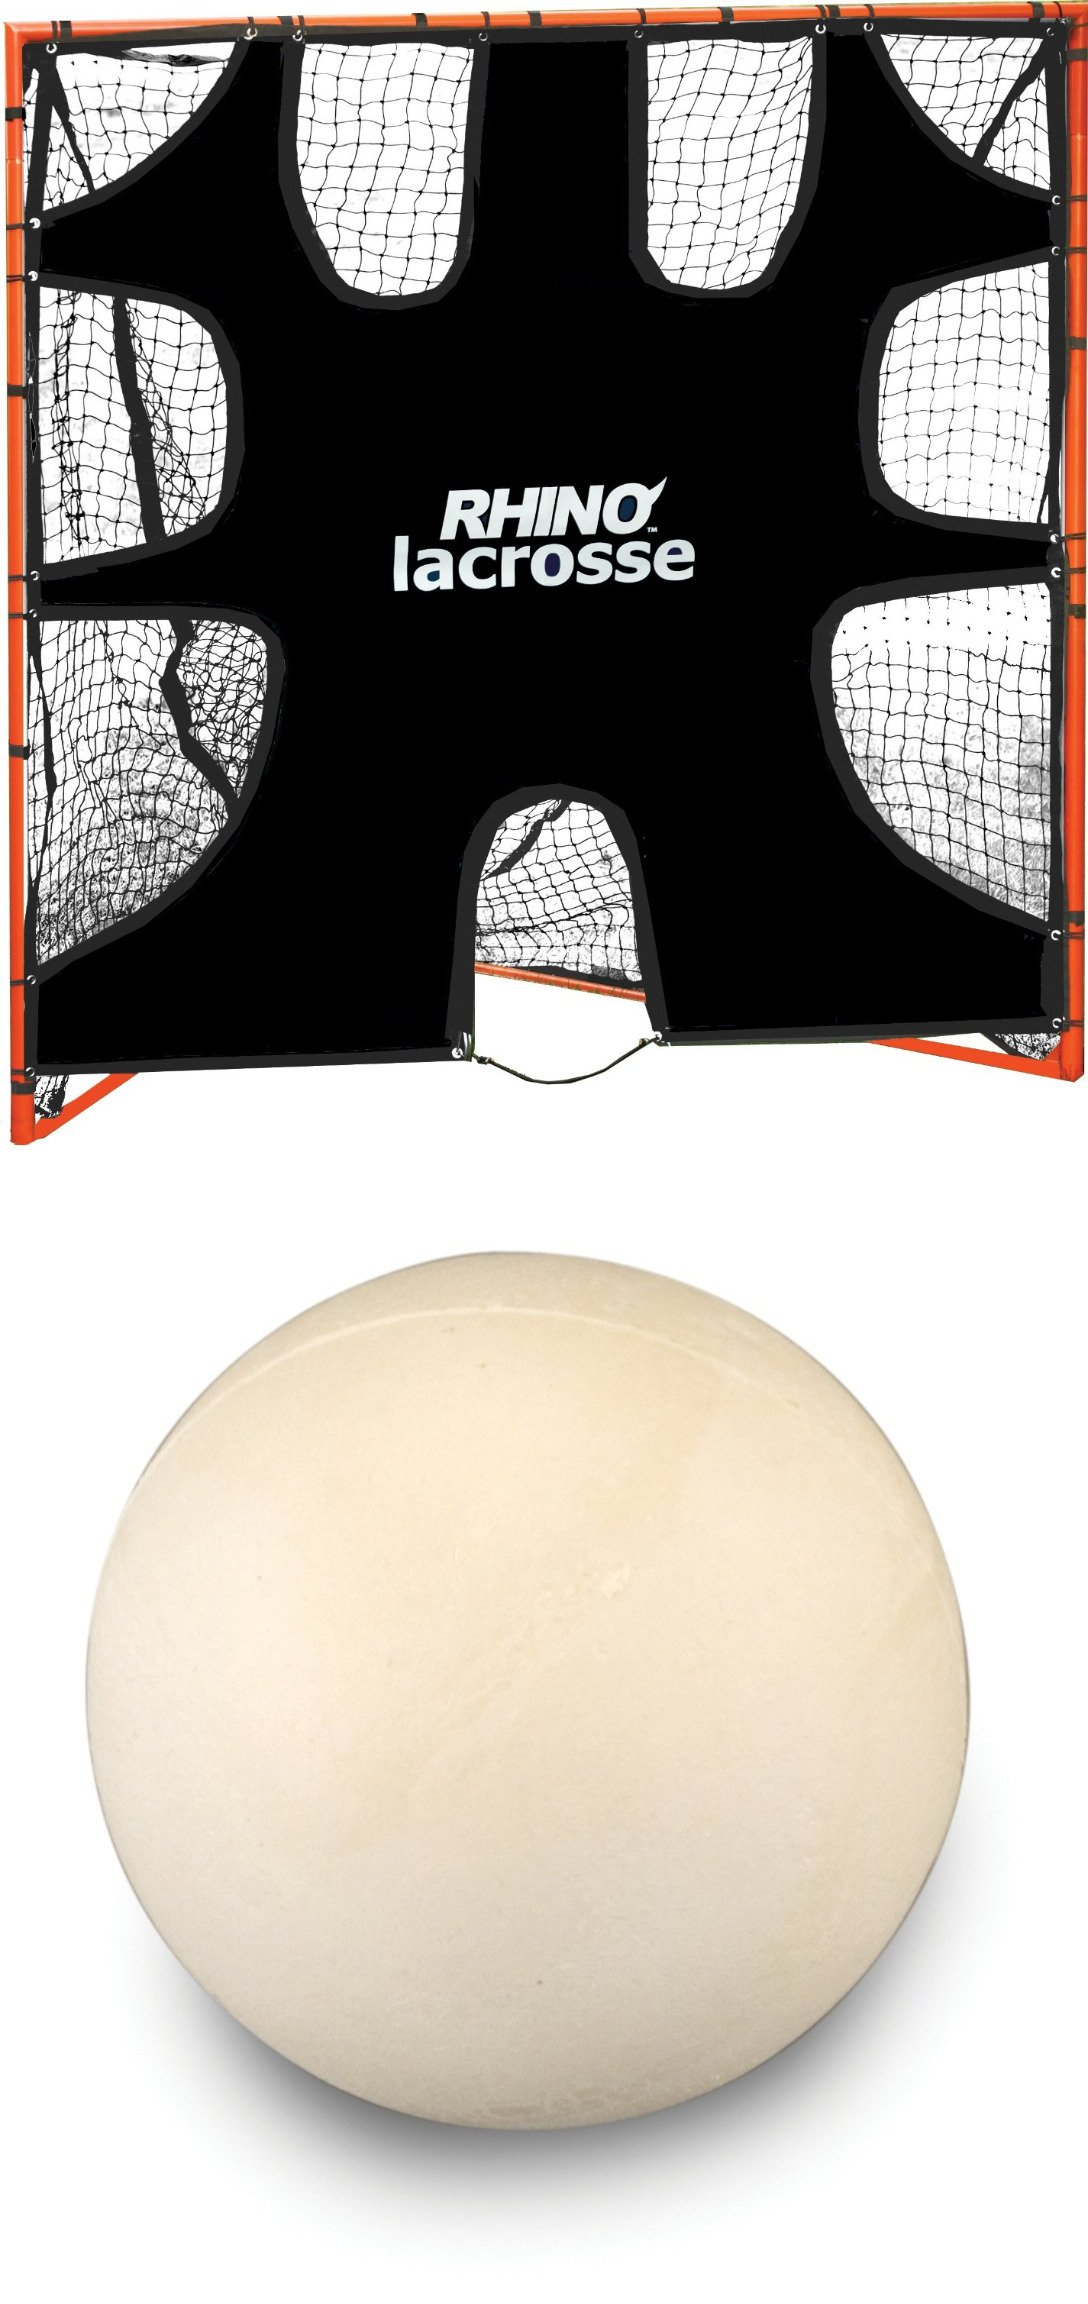 Champion Lacrosse Goal Target+Soft hollow training lacrosse ball. pack 6 WHITE